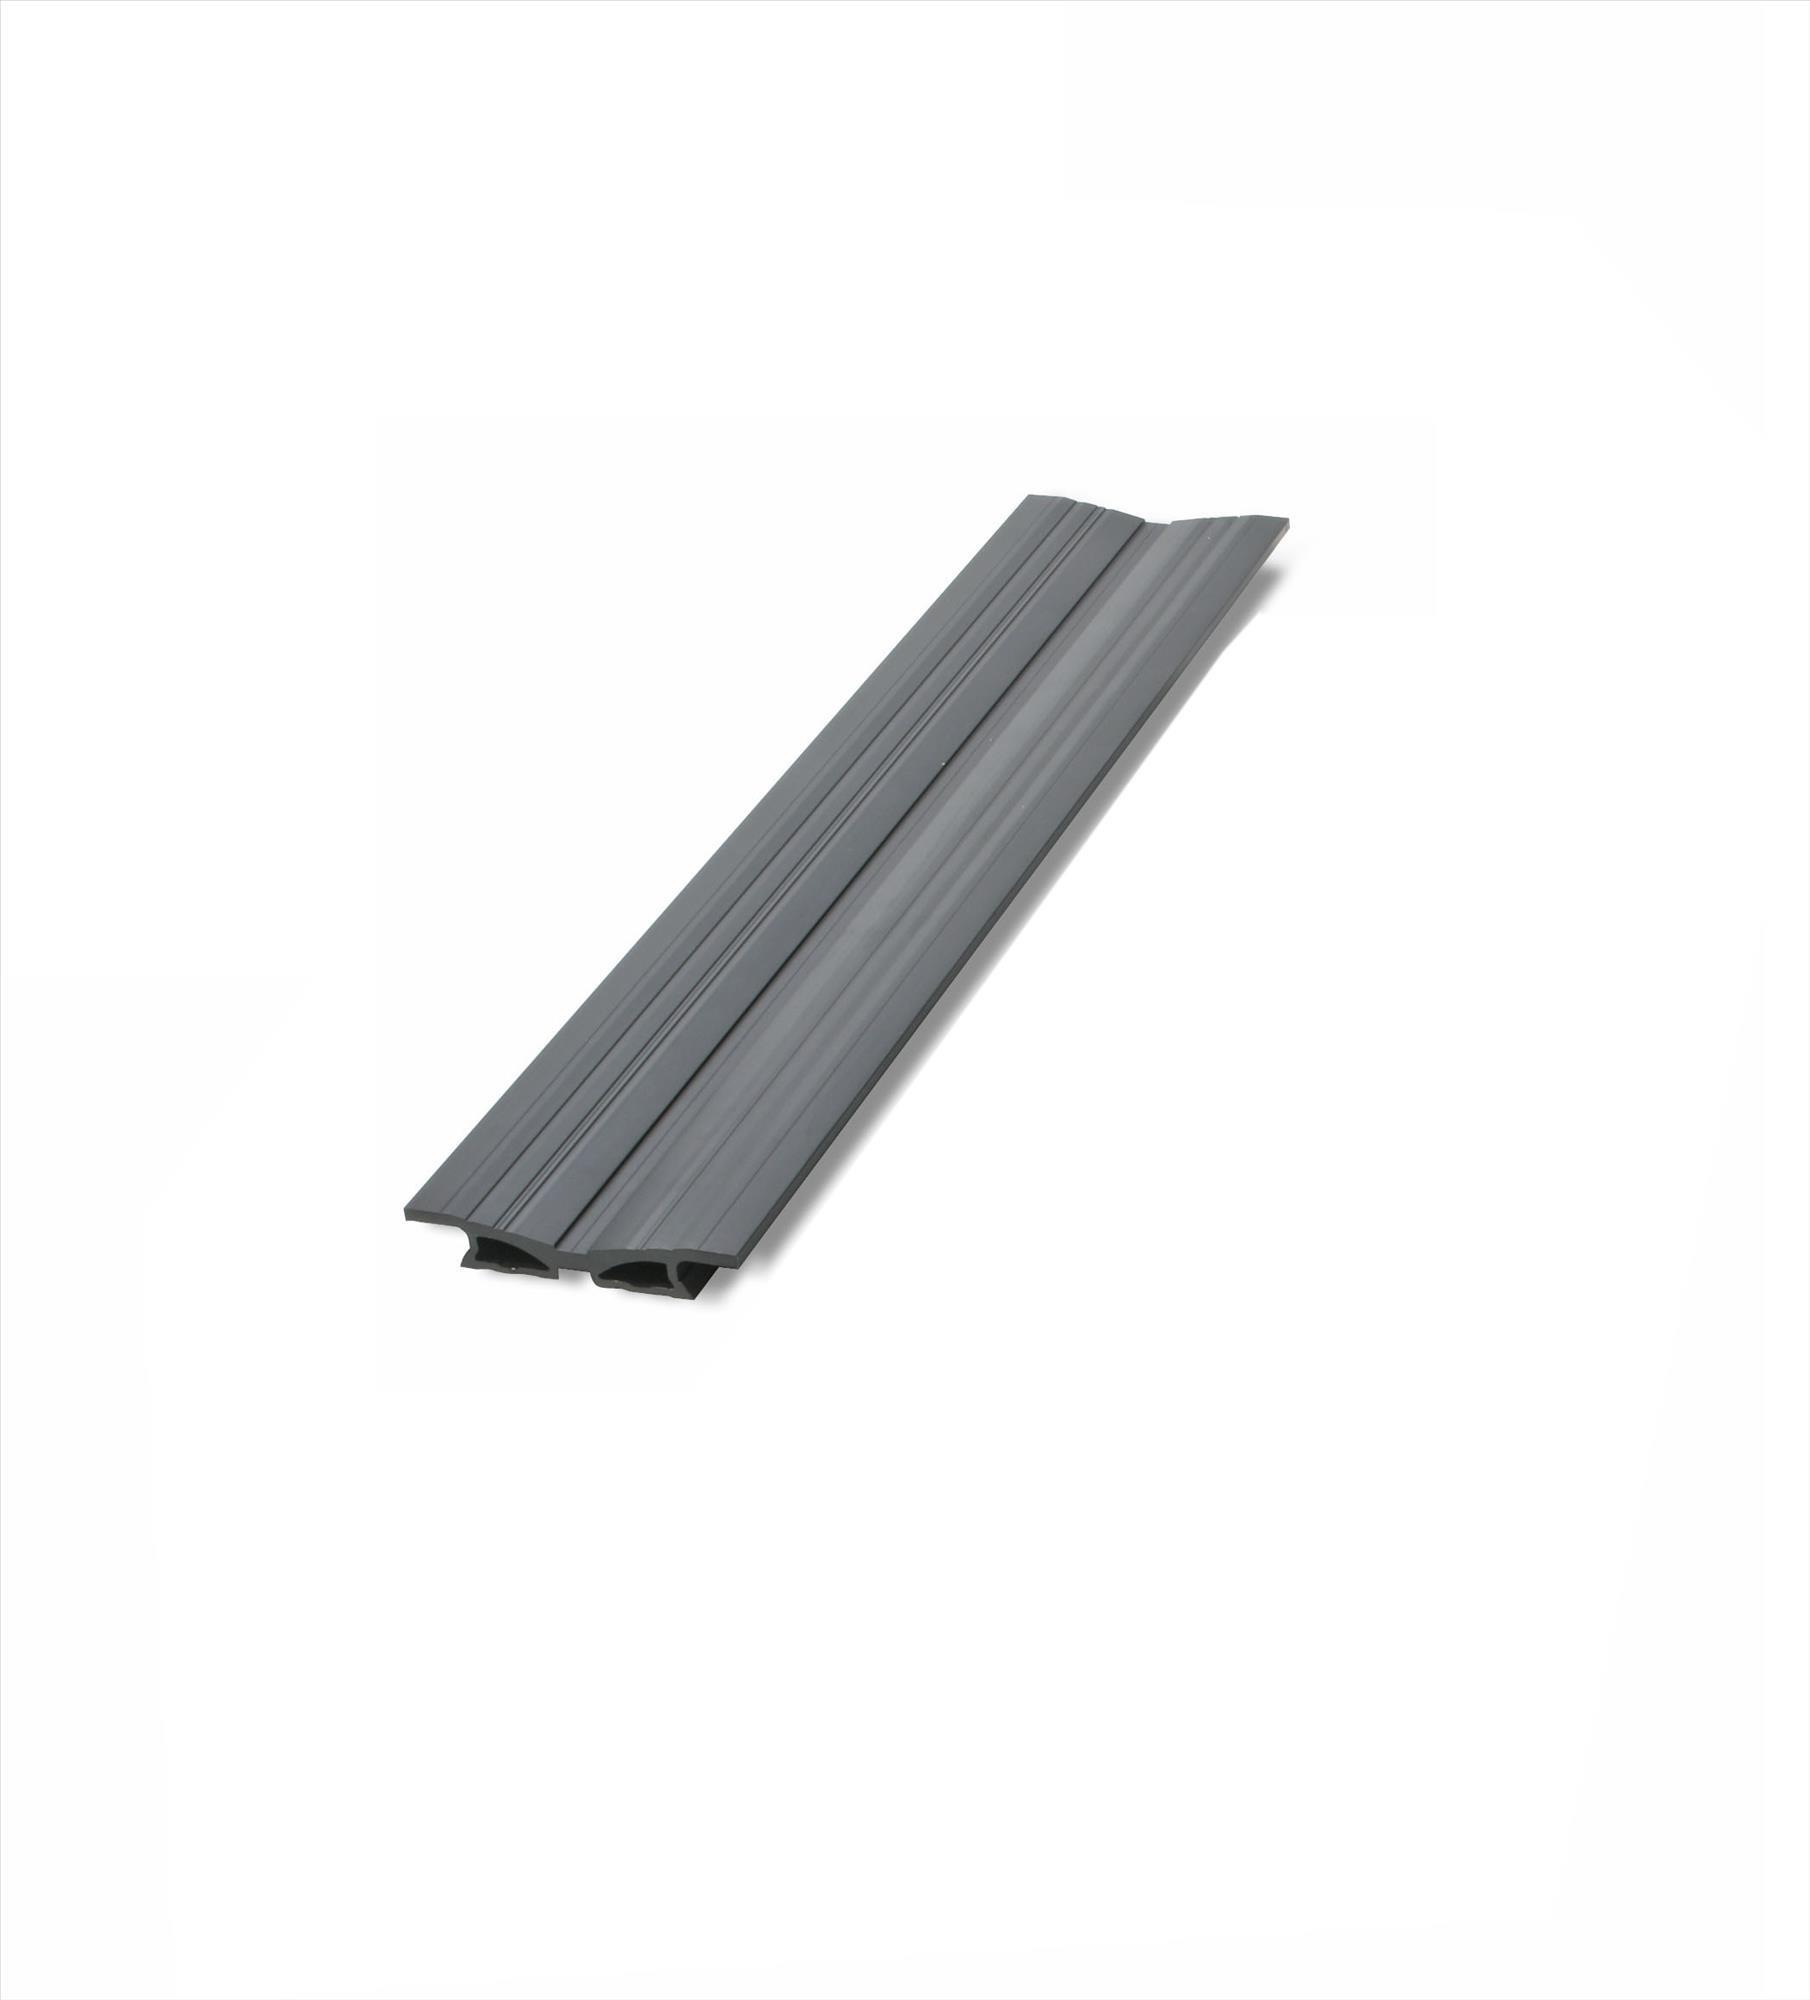 "Baader 3"" Dove Tail Bar 530mm (20,5"")"